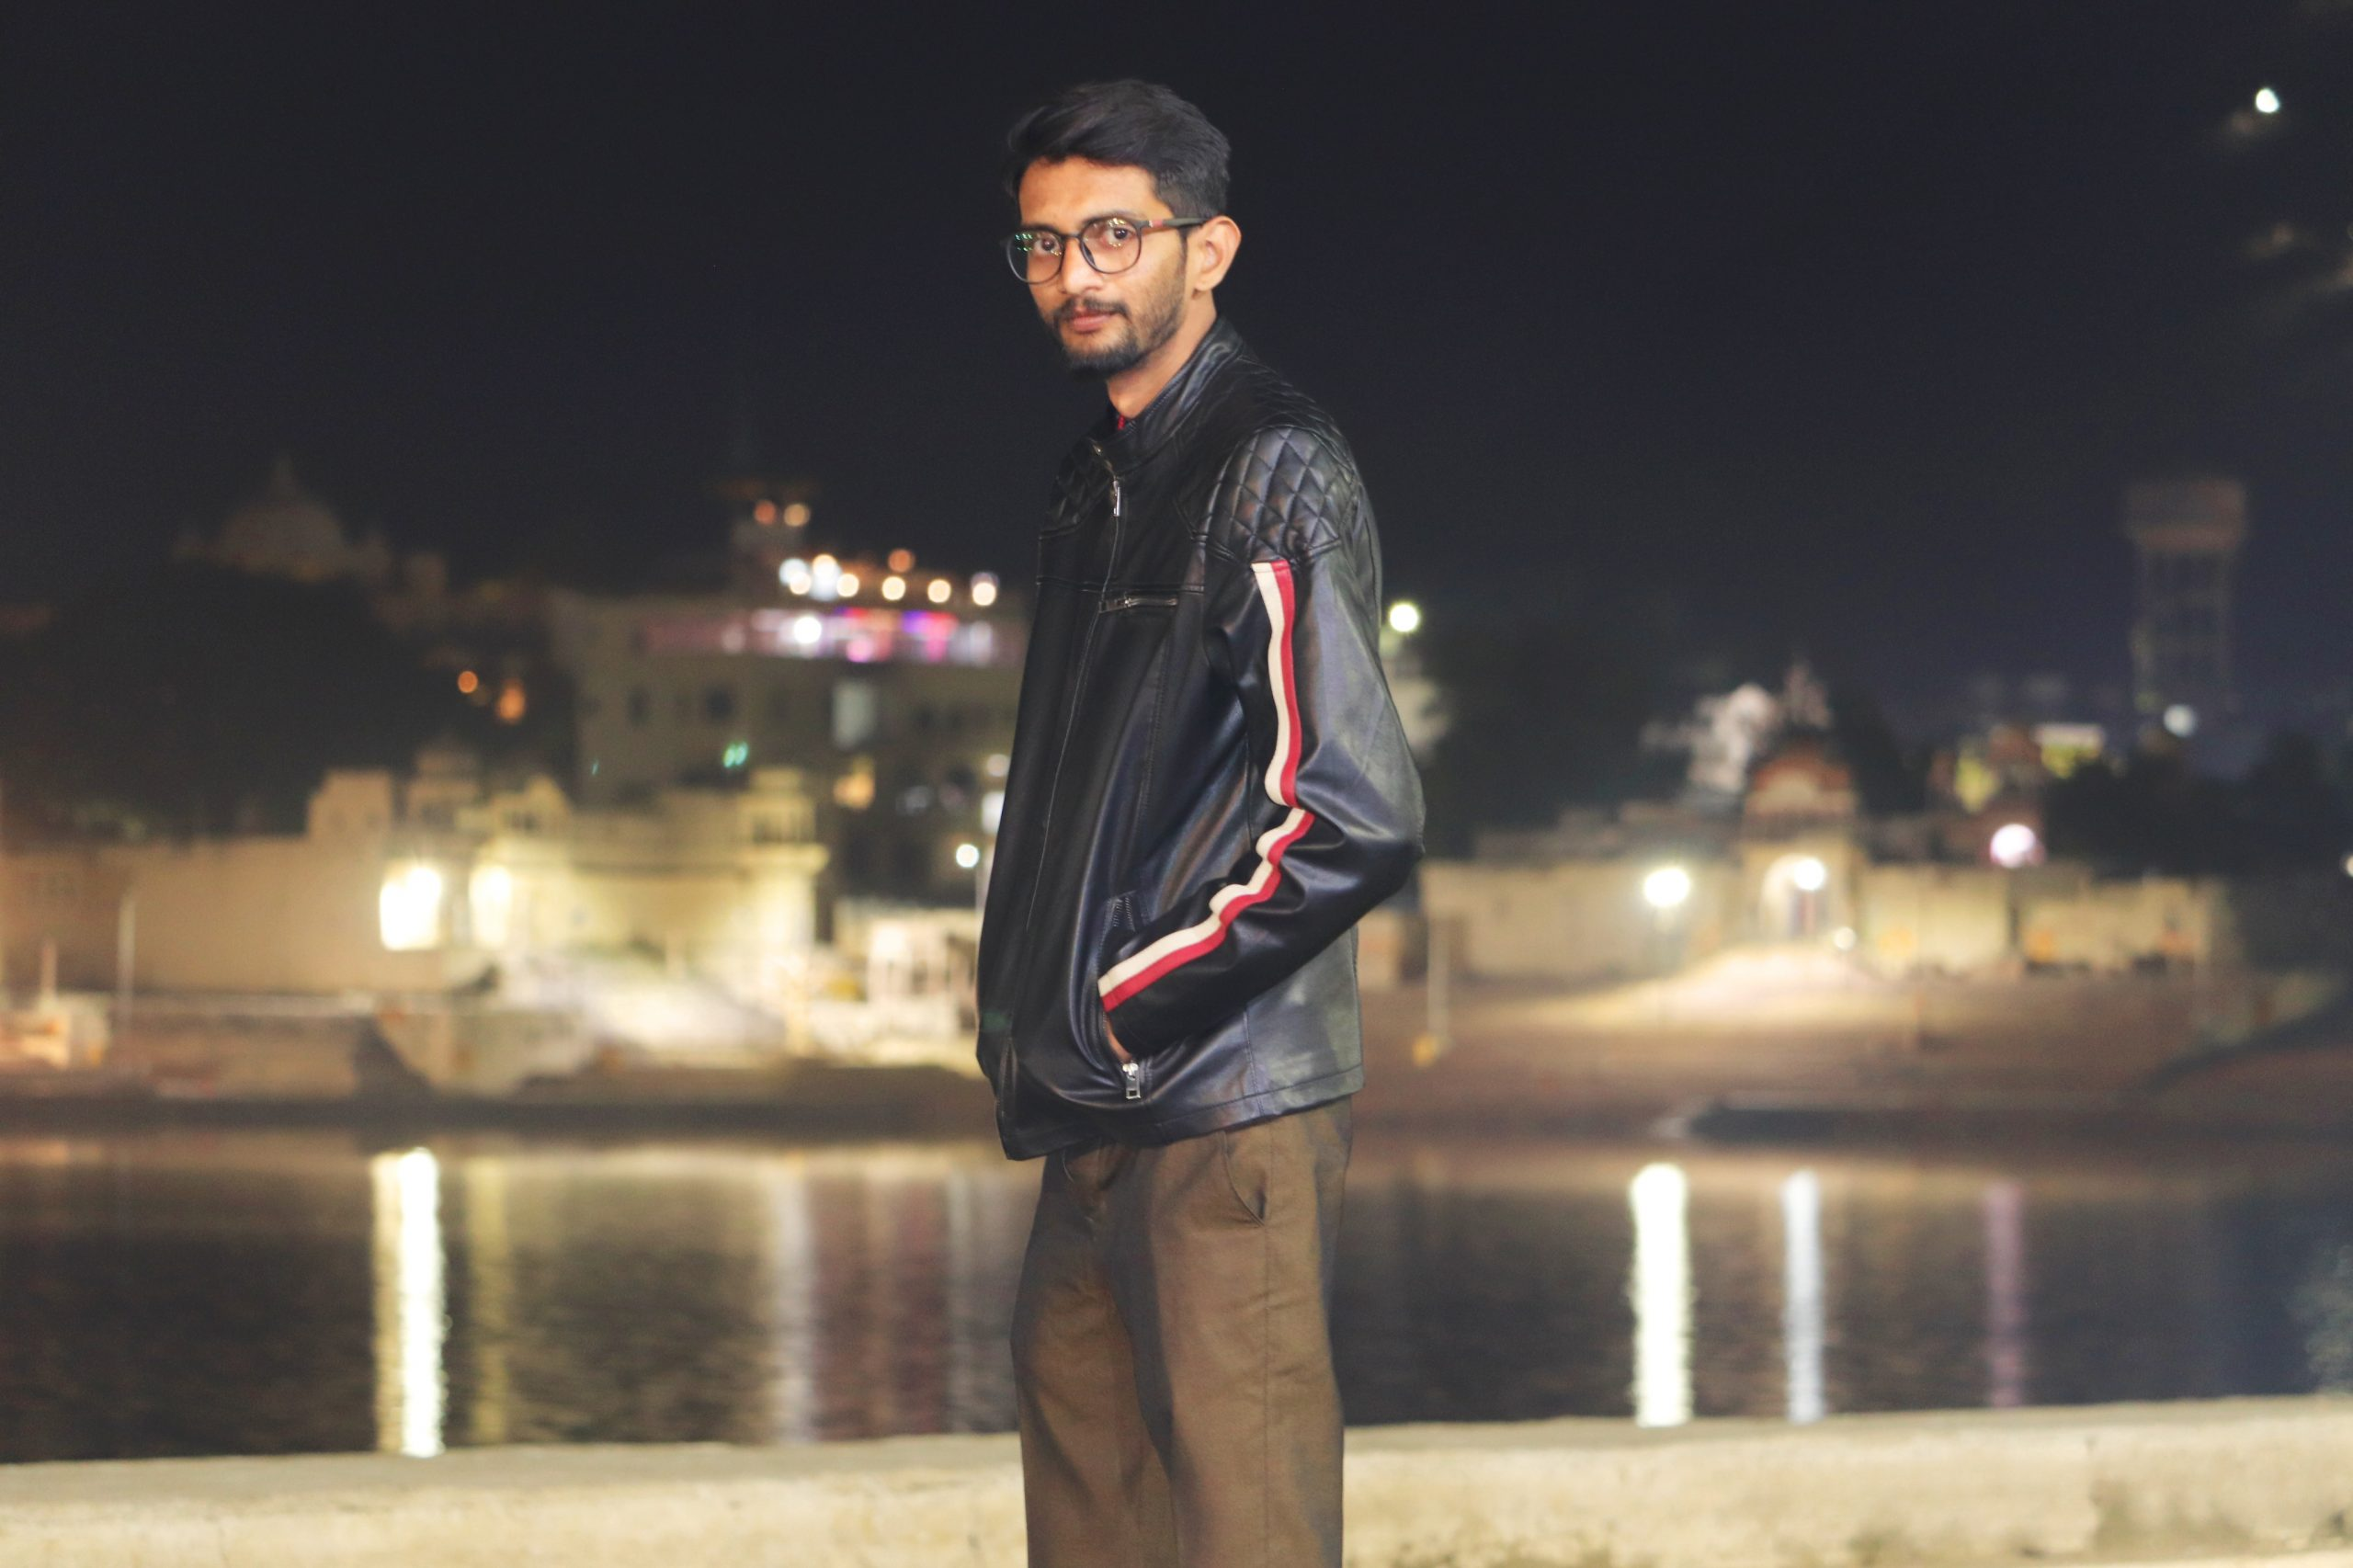 Model boy posing in the night